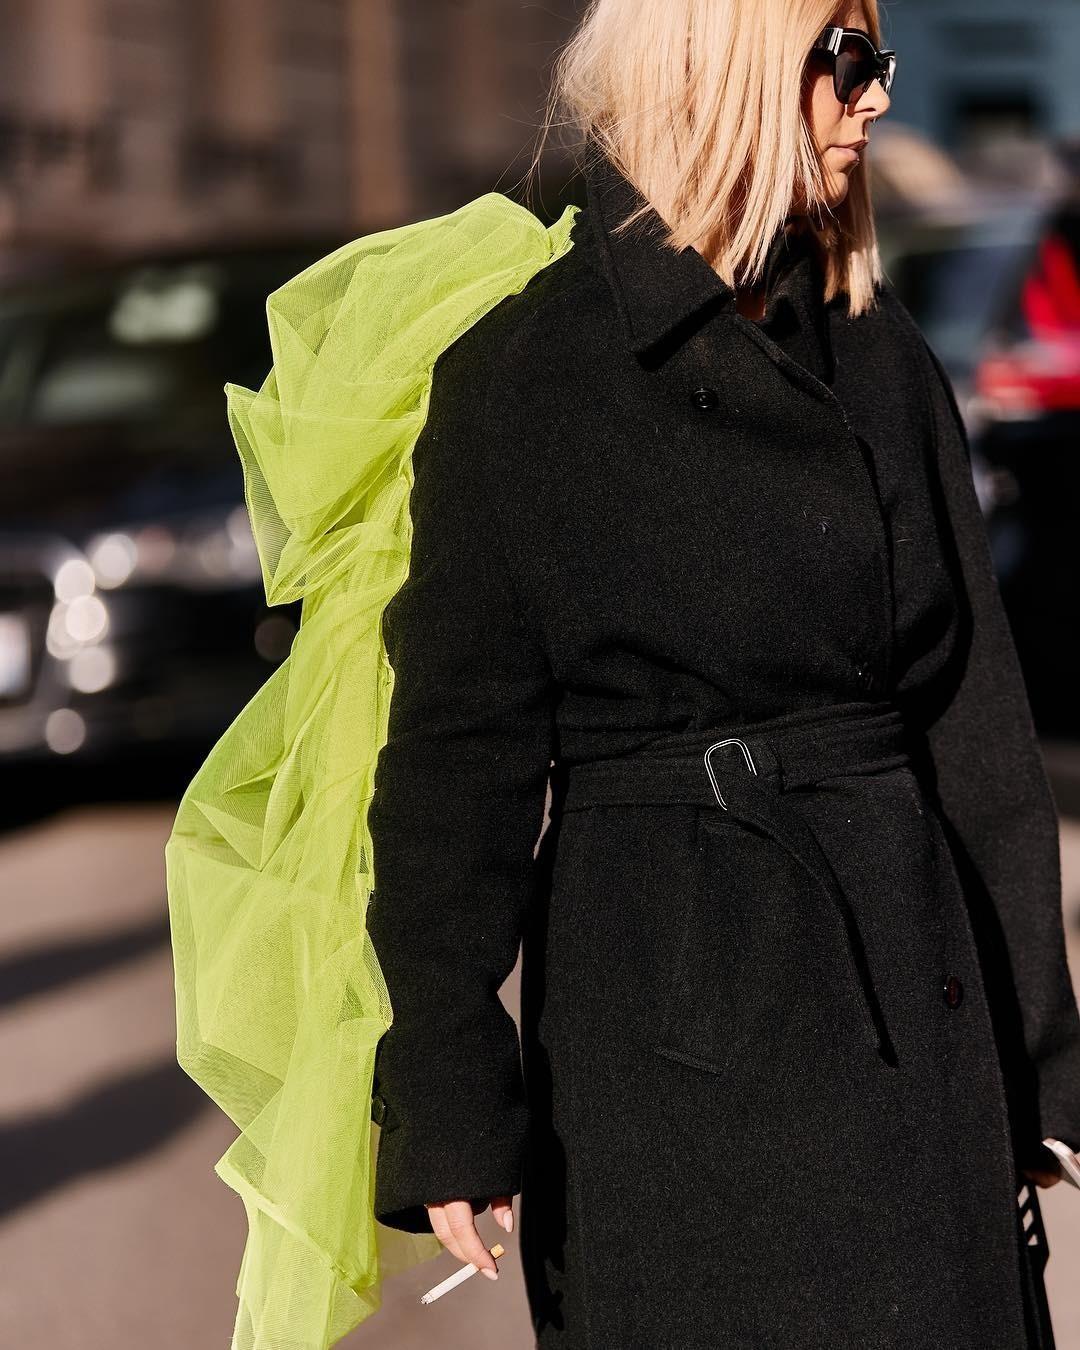 Ярче солнца: как звезды стритстайла носят неоновые вещи